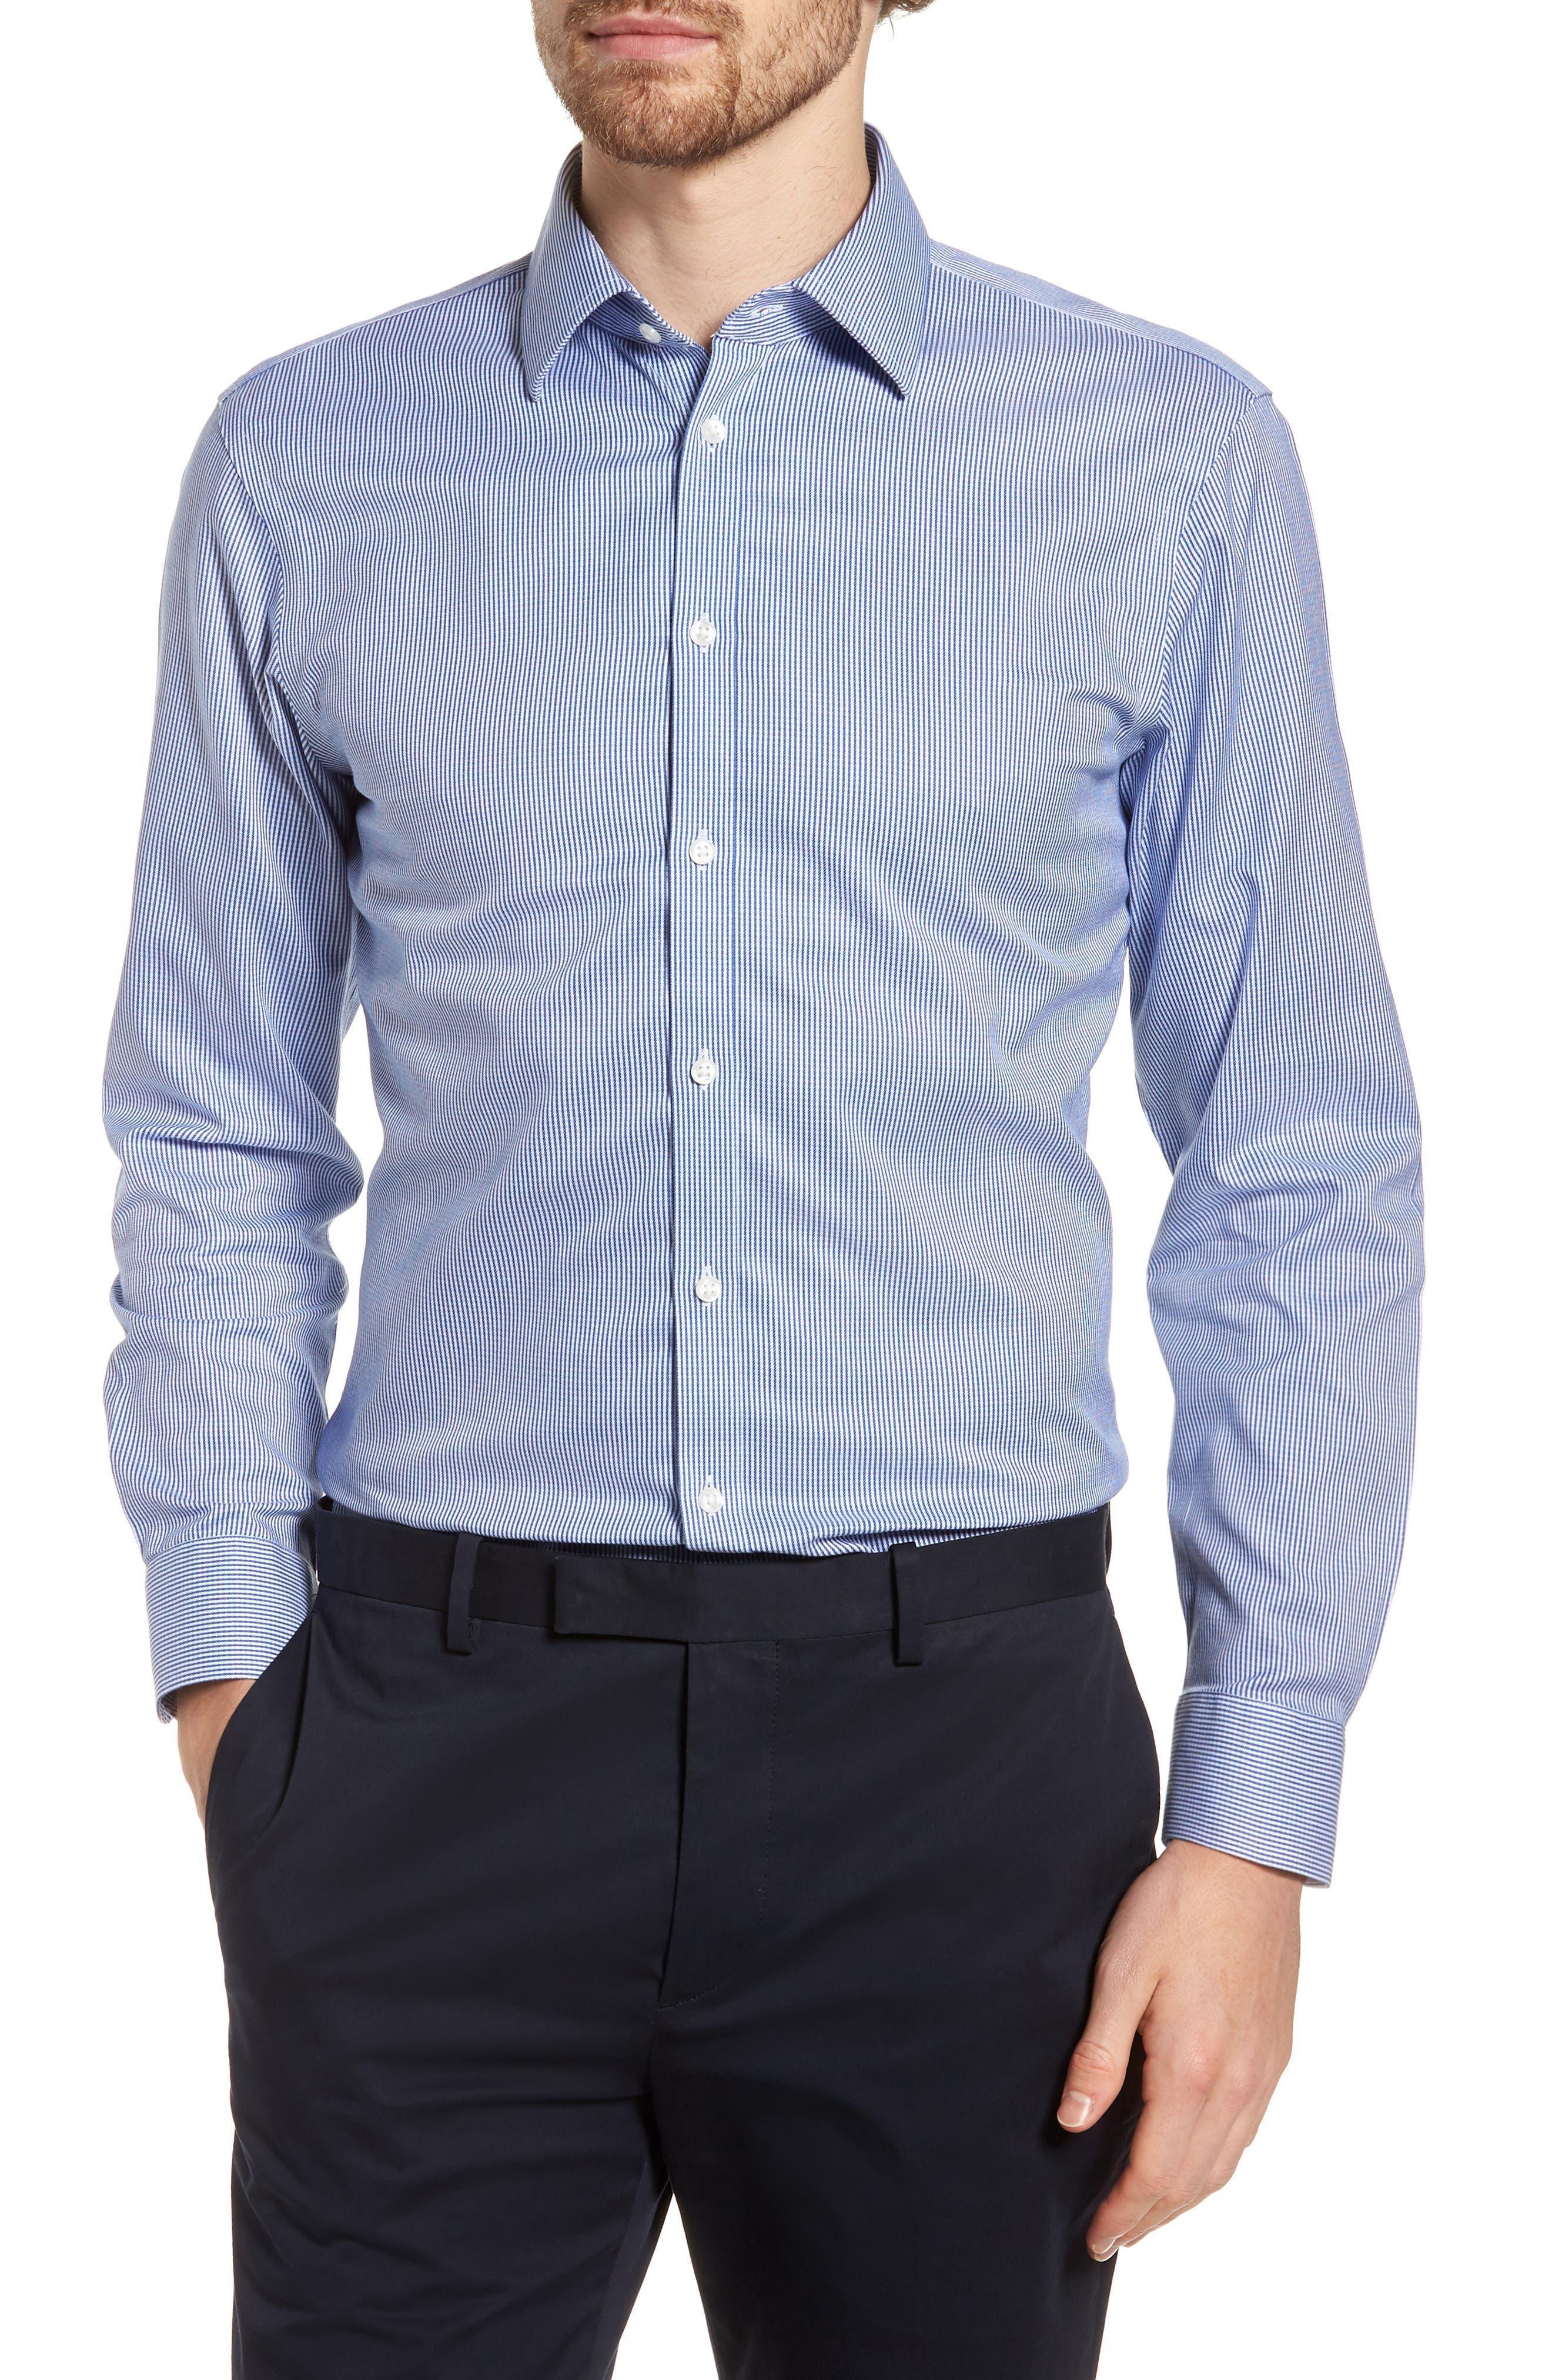 Smartcare<sup>™</sup> Extra Trim Fit Stripe Dress Shirt,                             Main thumbnail 1, color,                             Navy Print